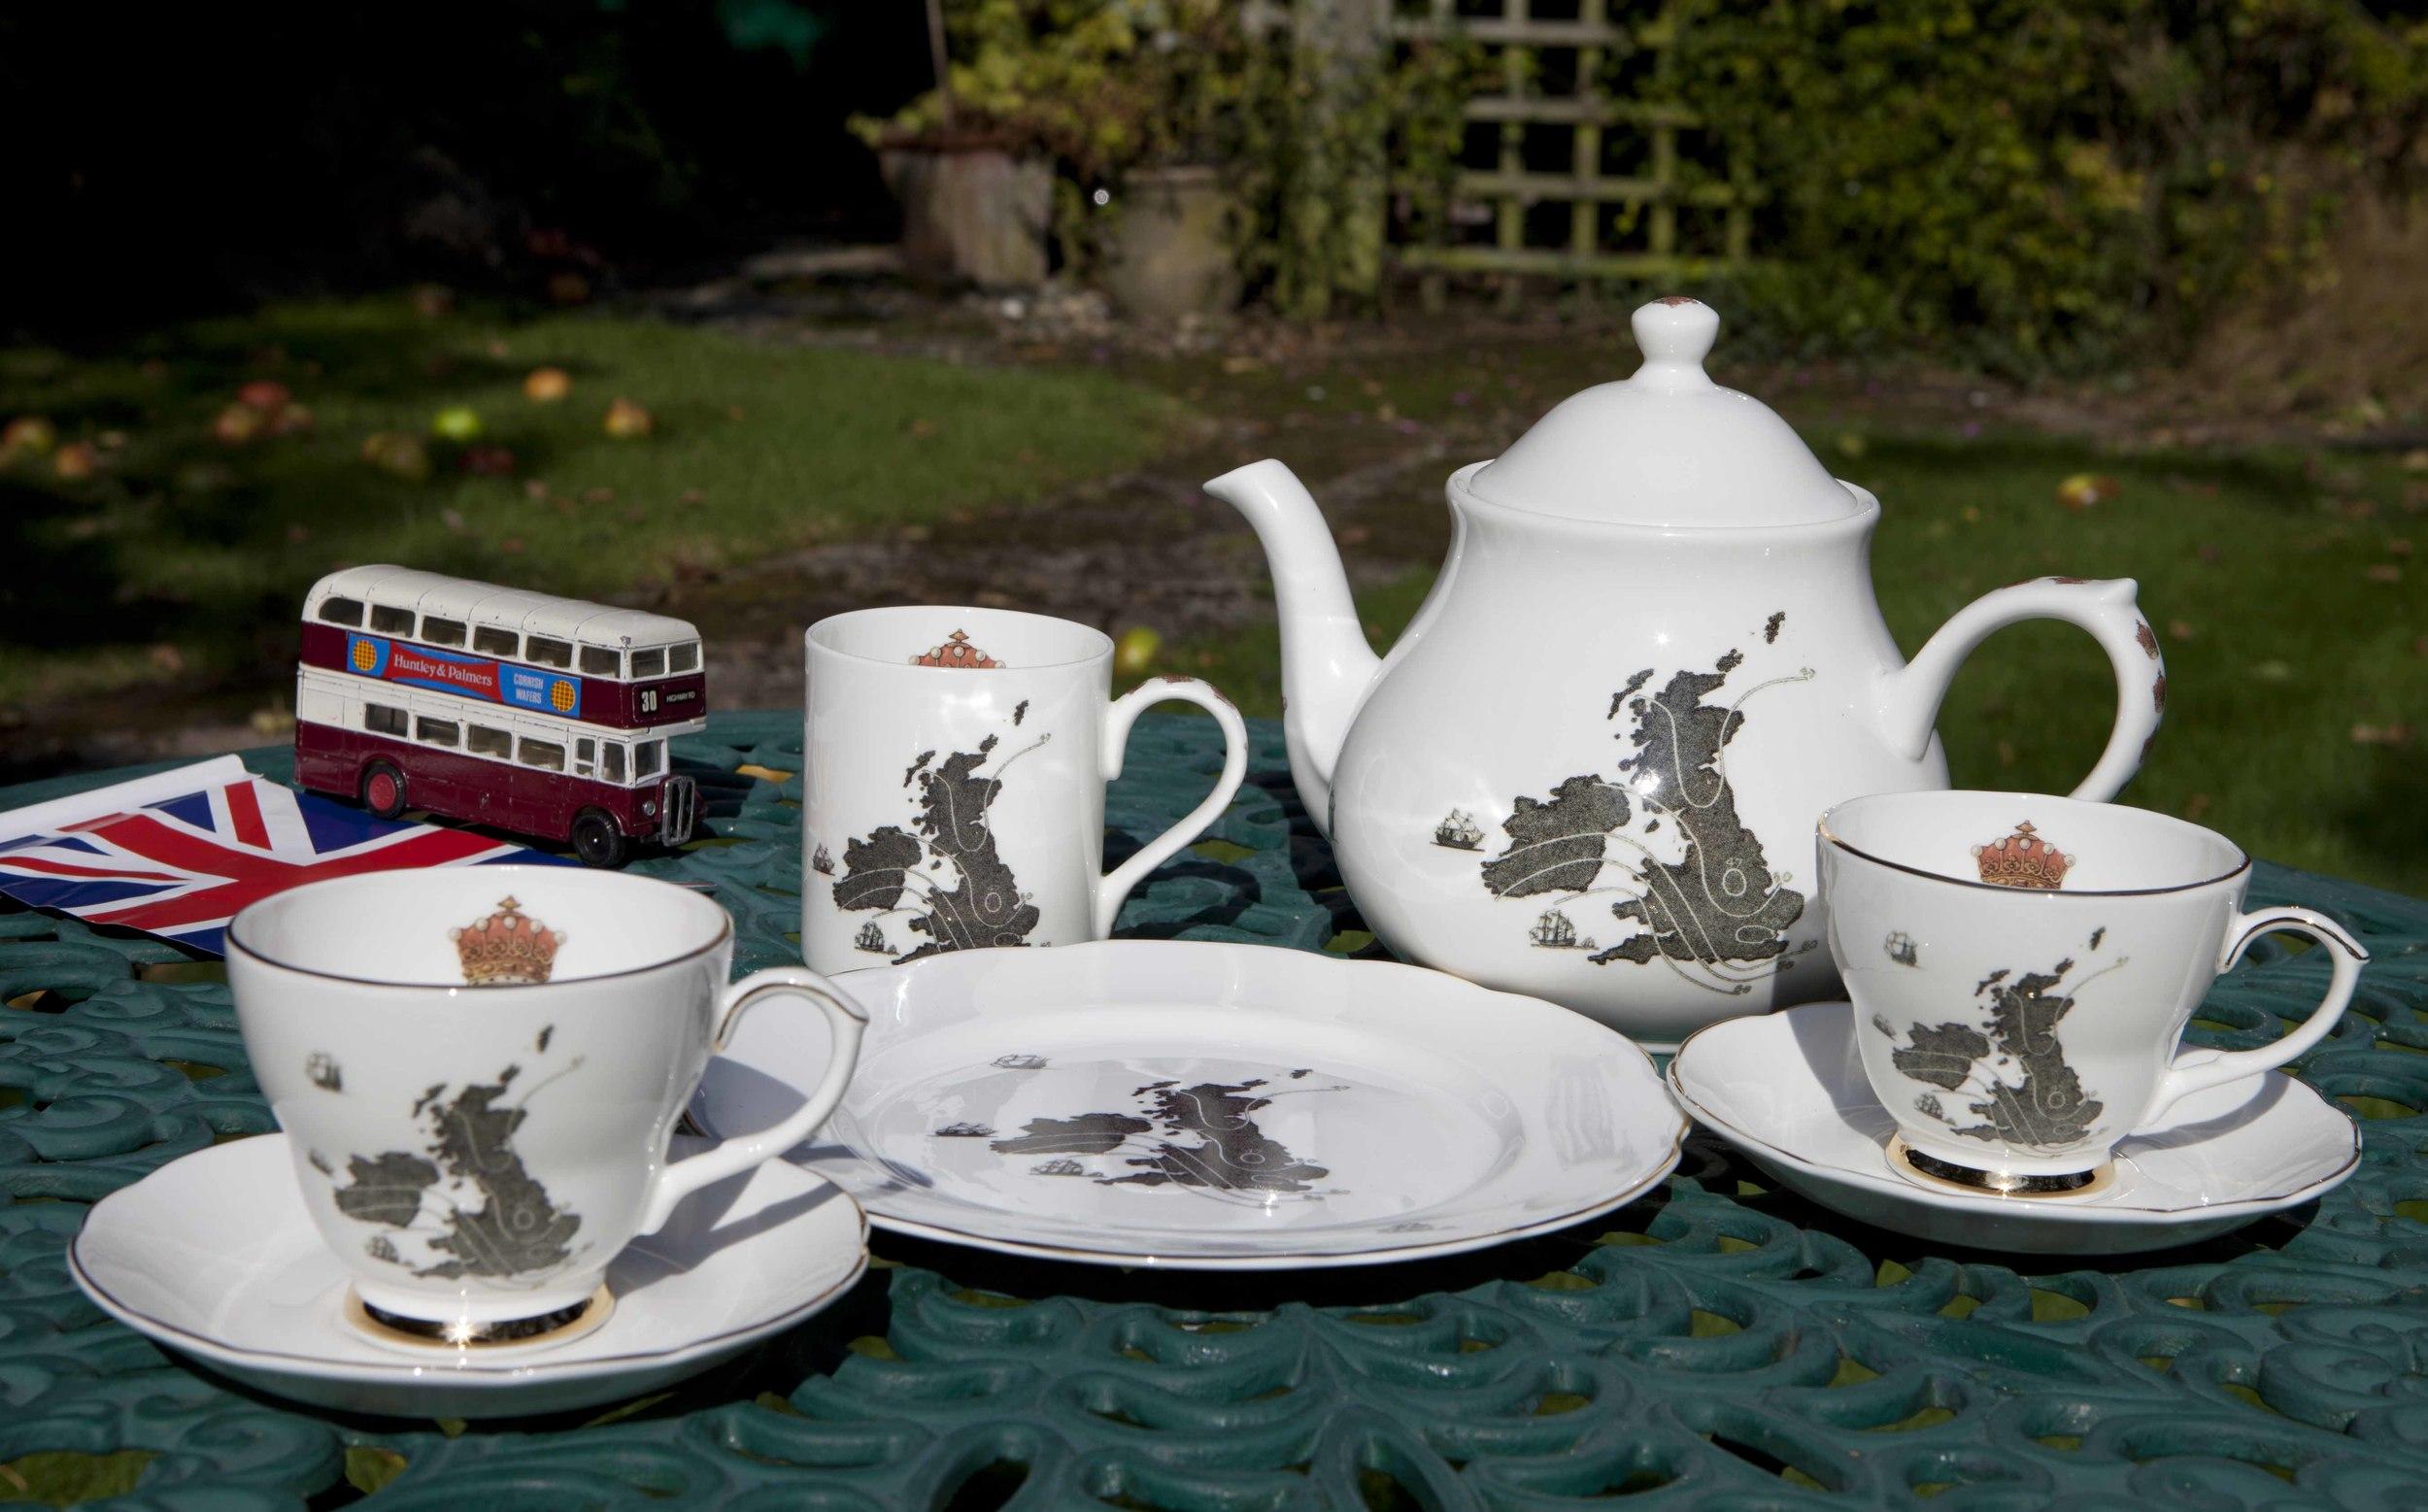 Ali Miller Teapot . As seen on BBC Sherlock TV Series. Ali Miller is a local South Hampstead Mum.